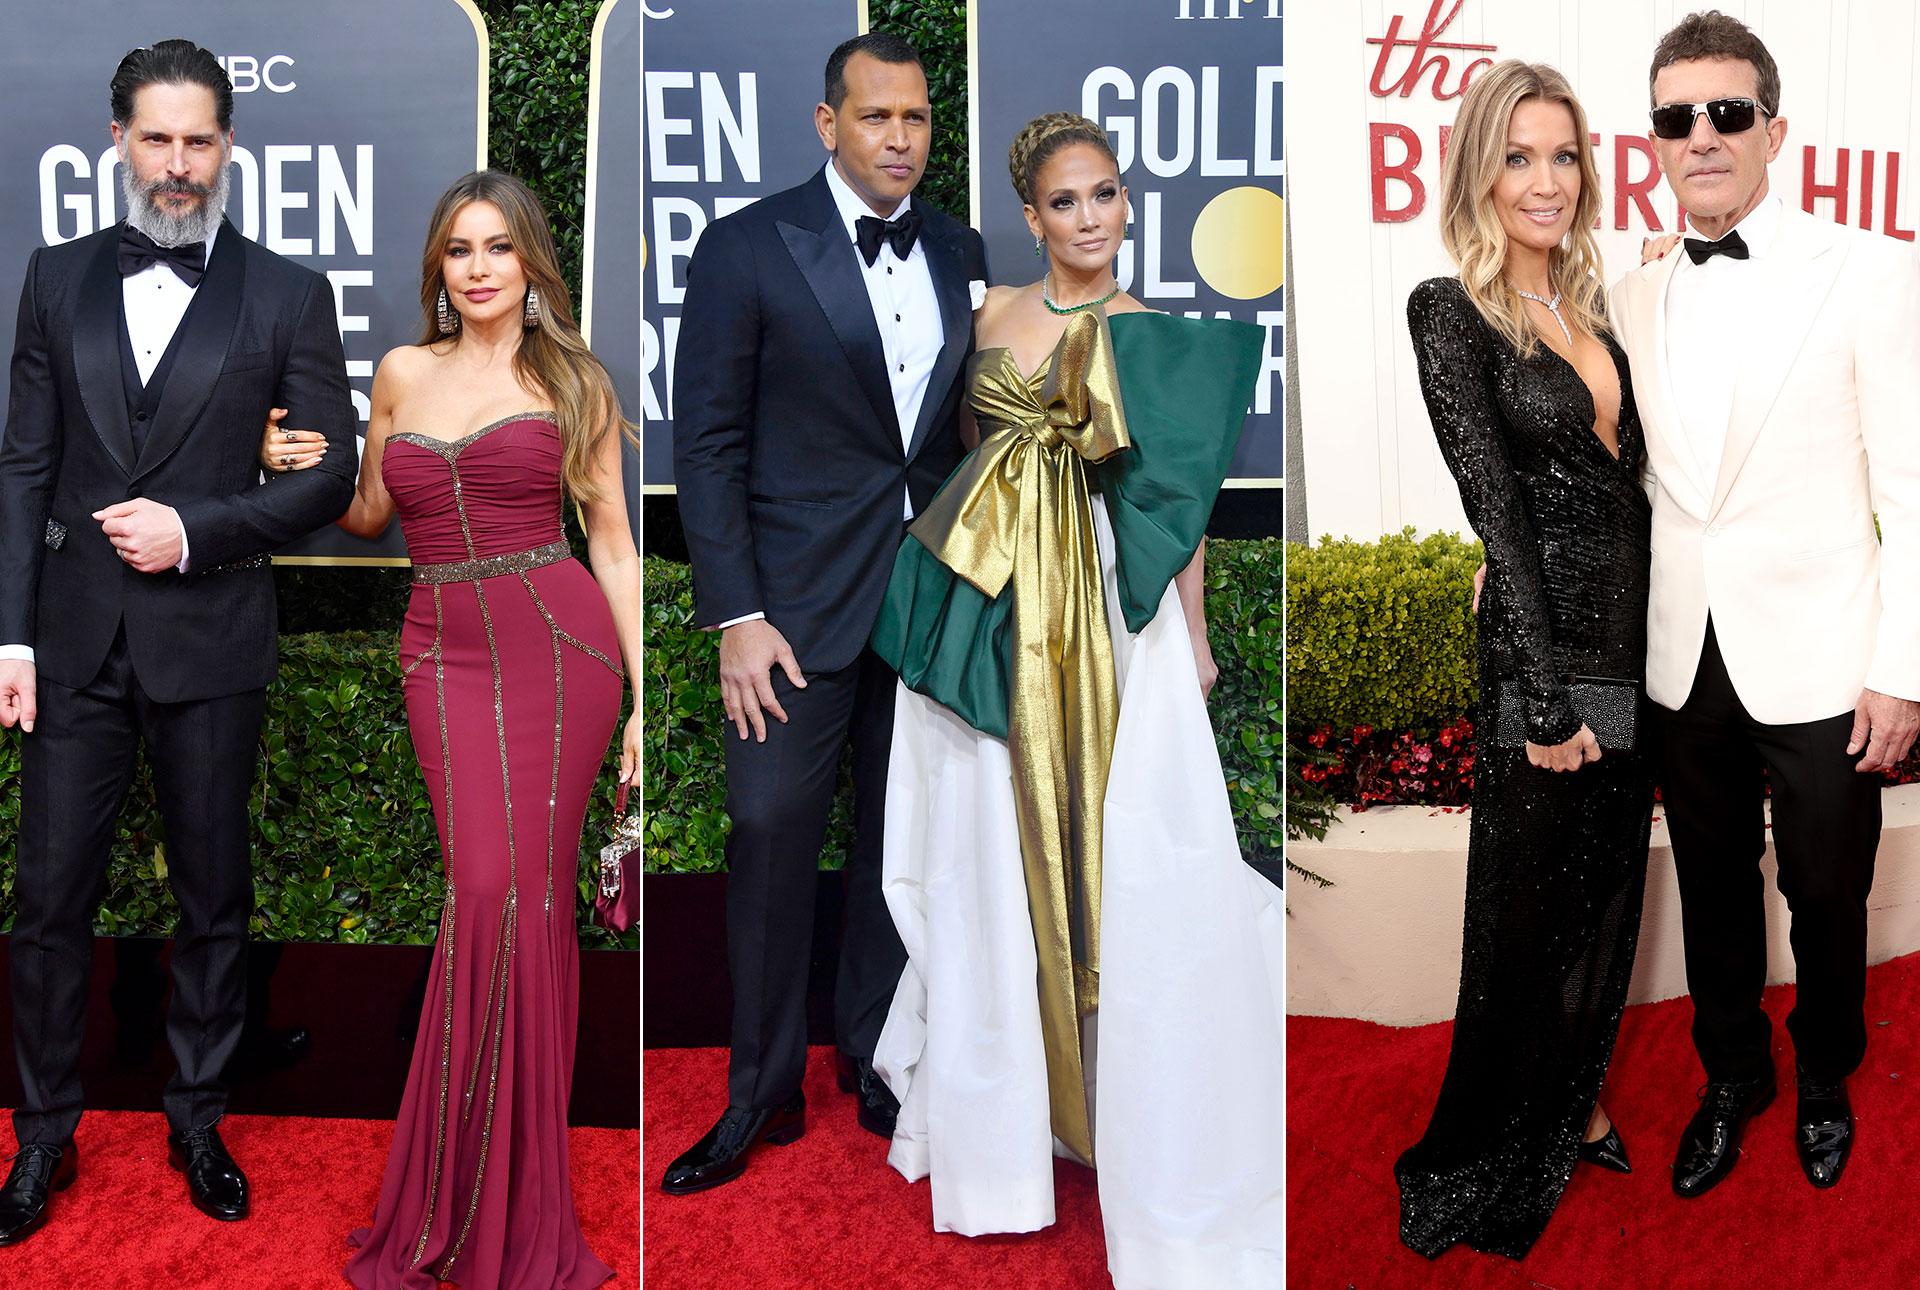 Sofia Verga, Joe Manganiello, Jennifer Lopez, Alex Rodriguez, Antonio Banderas, Alfombra roja golden globes 2020